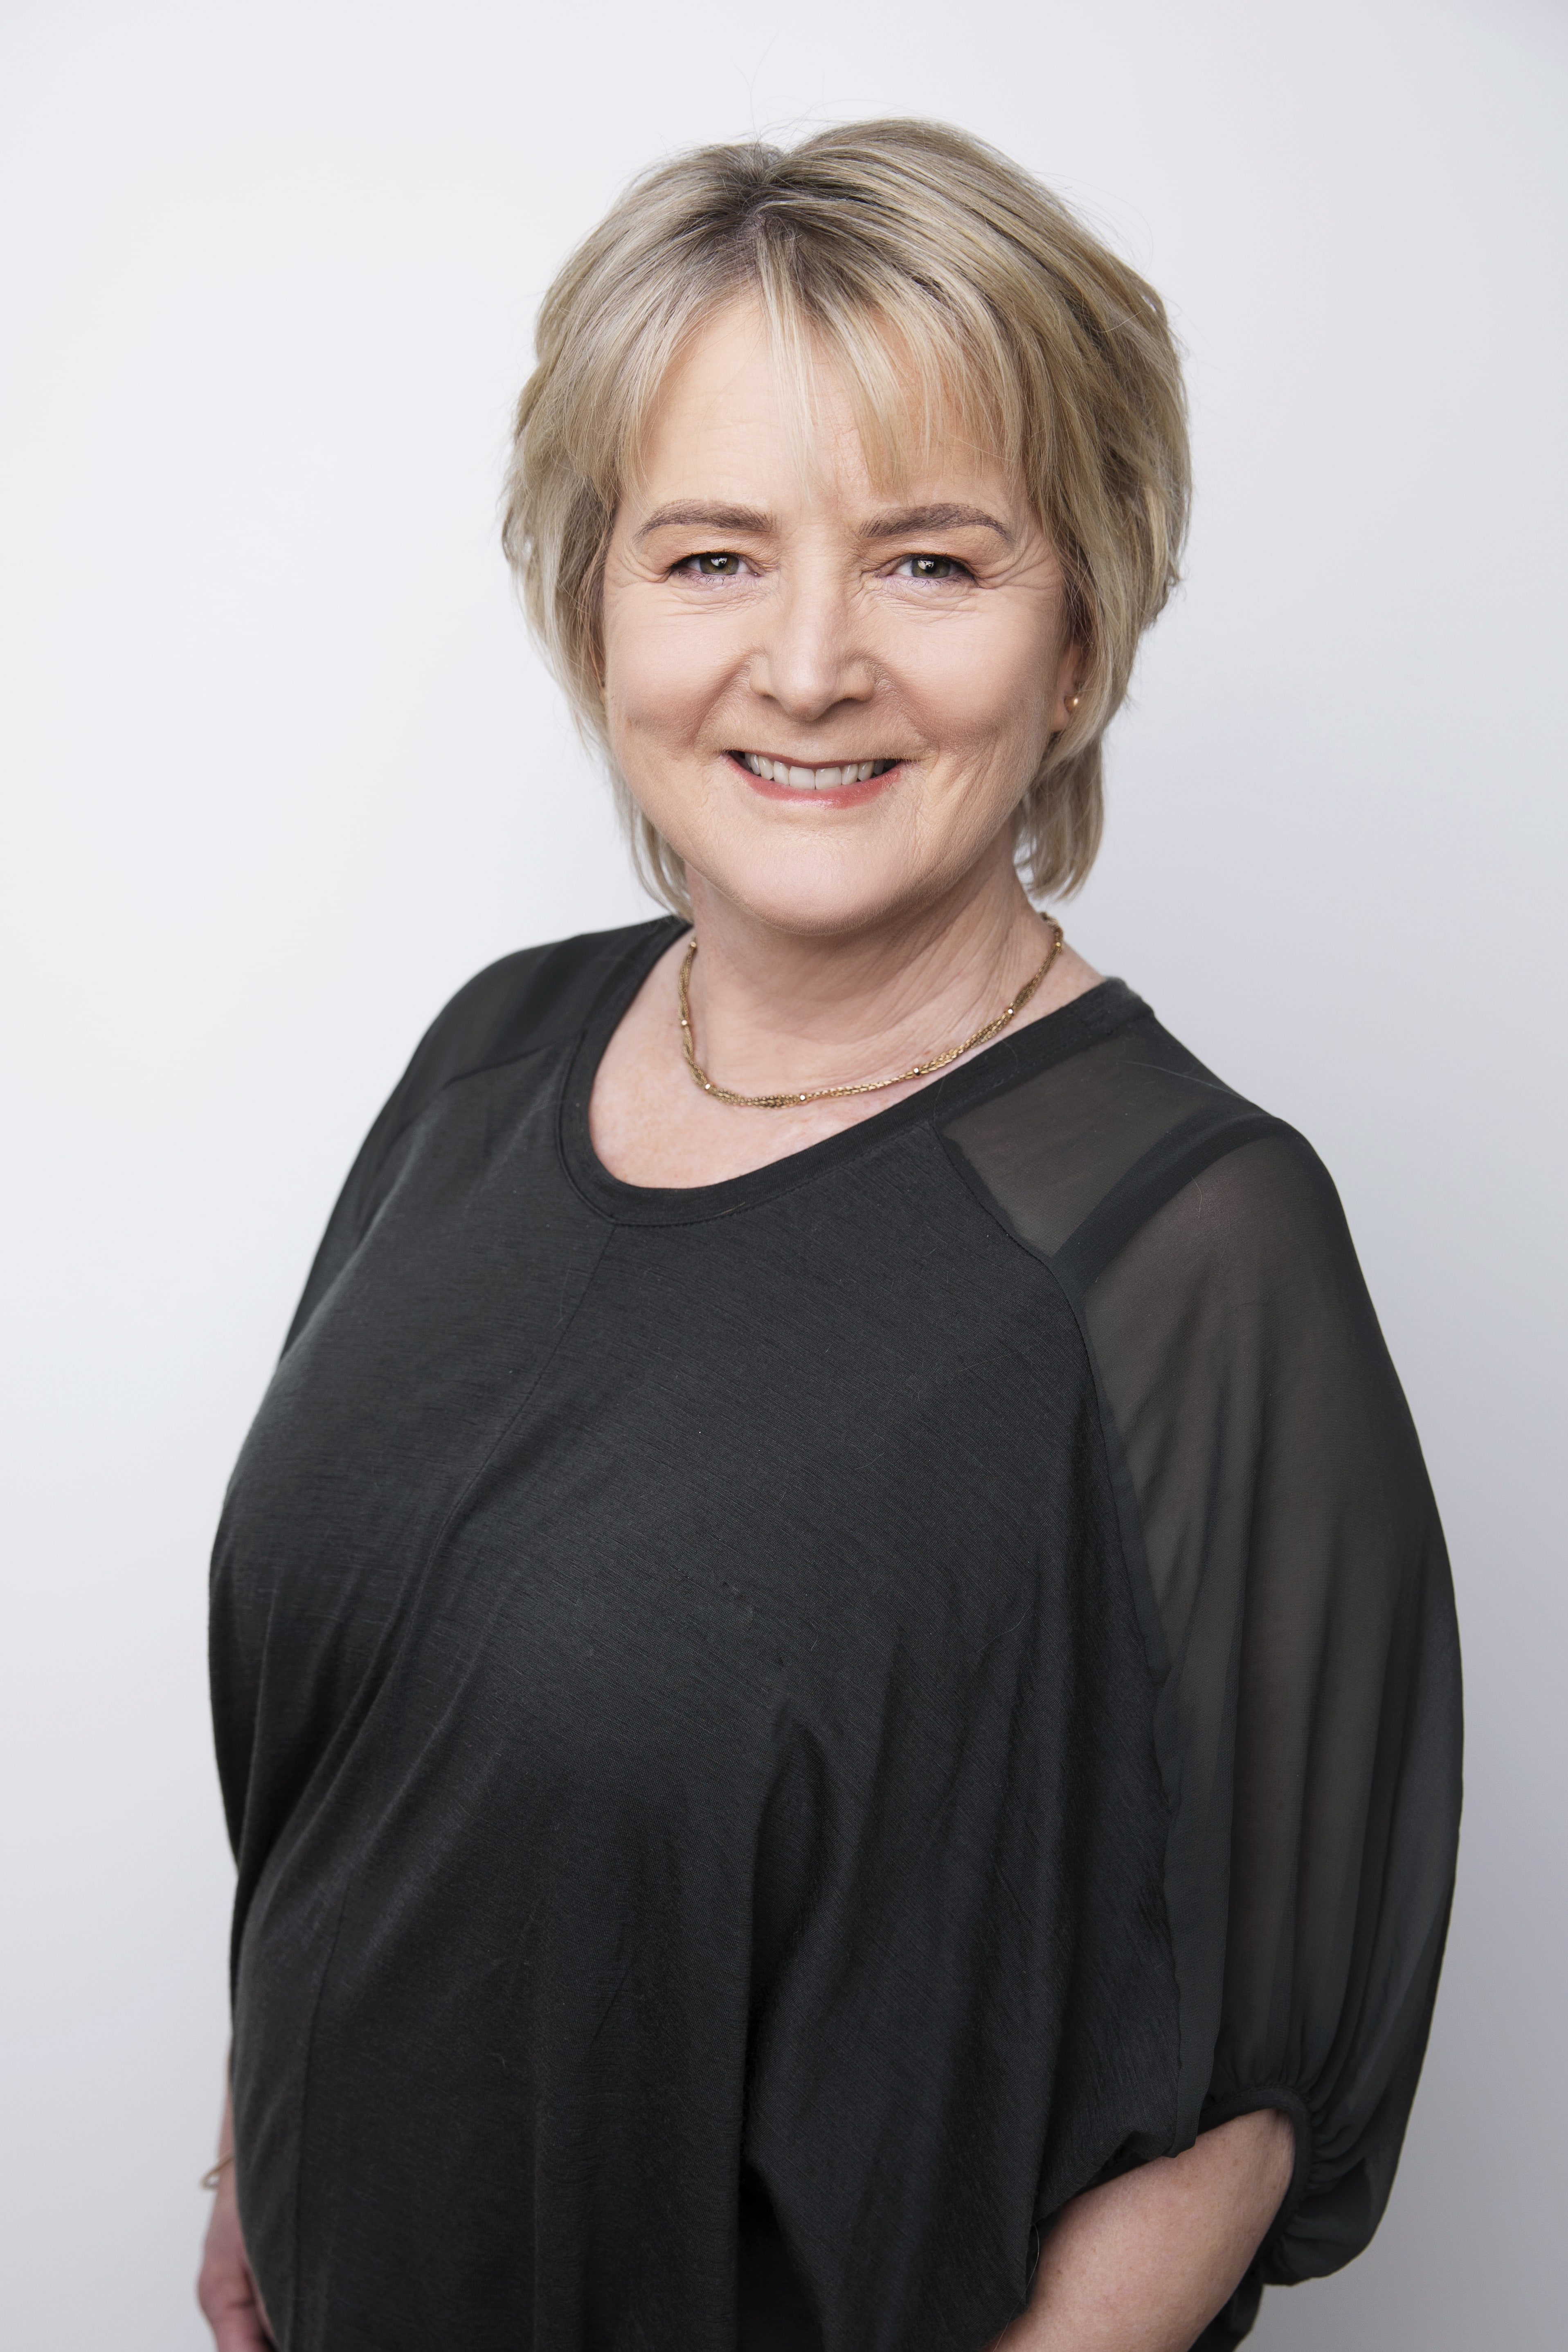 Susan Turton